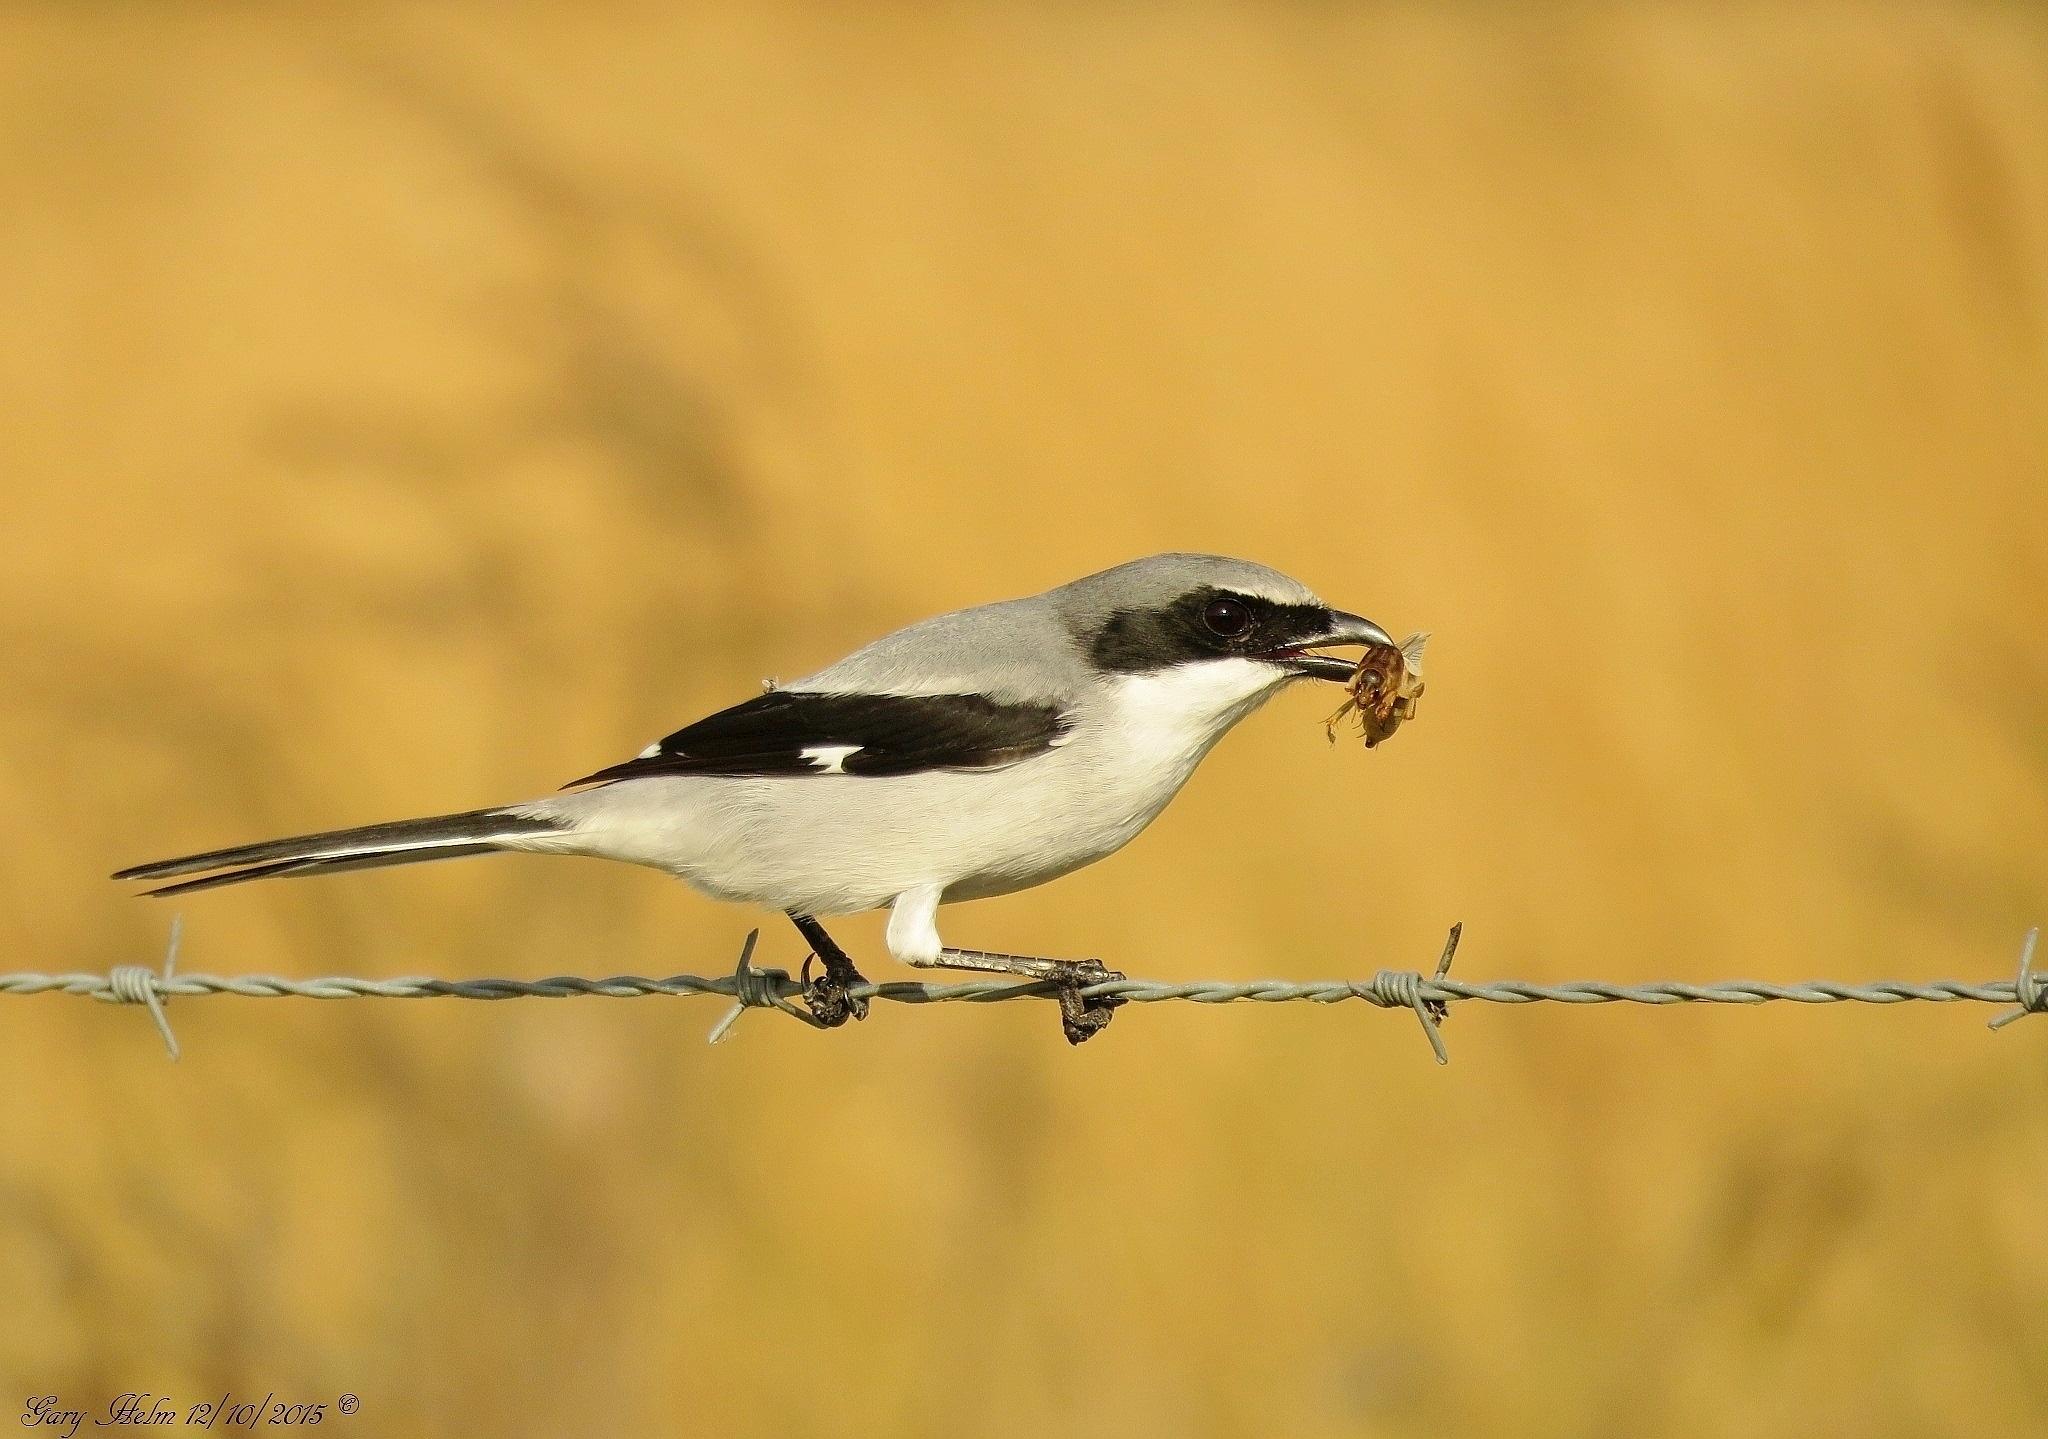 Loggerhead Shrike by Gary Helm